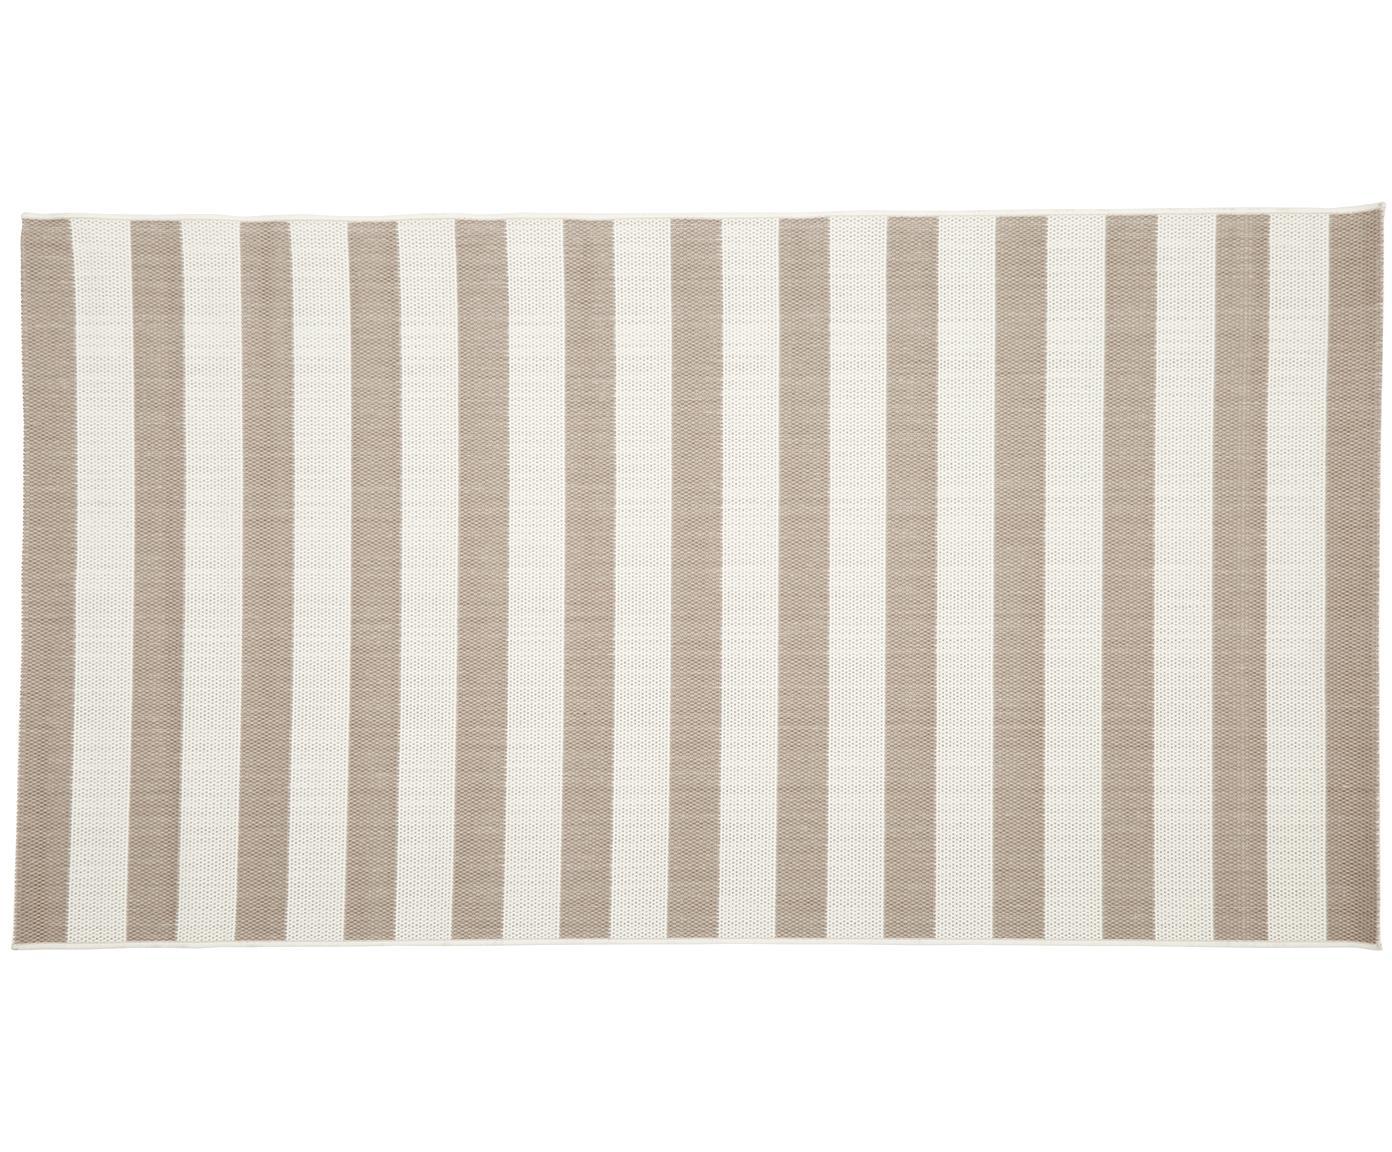 Gestreifter In- & Outdoor-Teppich Axa in Beige/Weiss, Flor: 100% Polypropylen, Cremeweiss, Beige, B 80 x L 150 cm (Grösse XS)